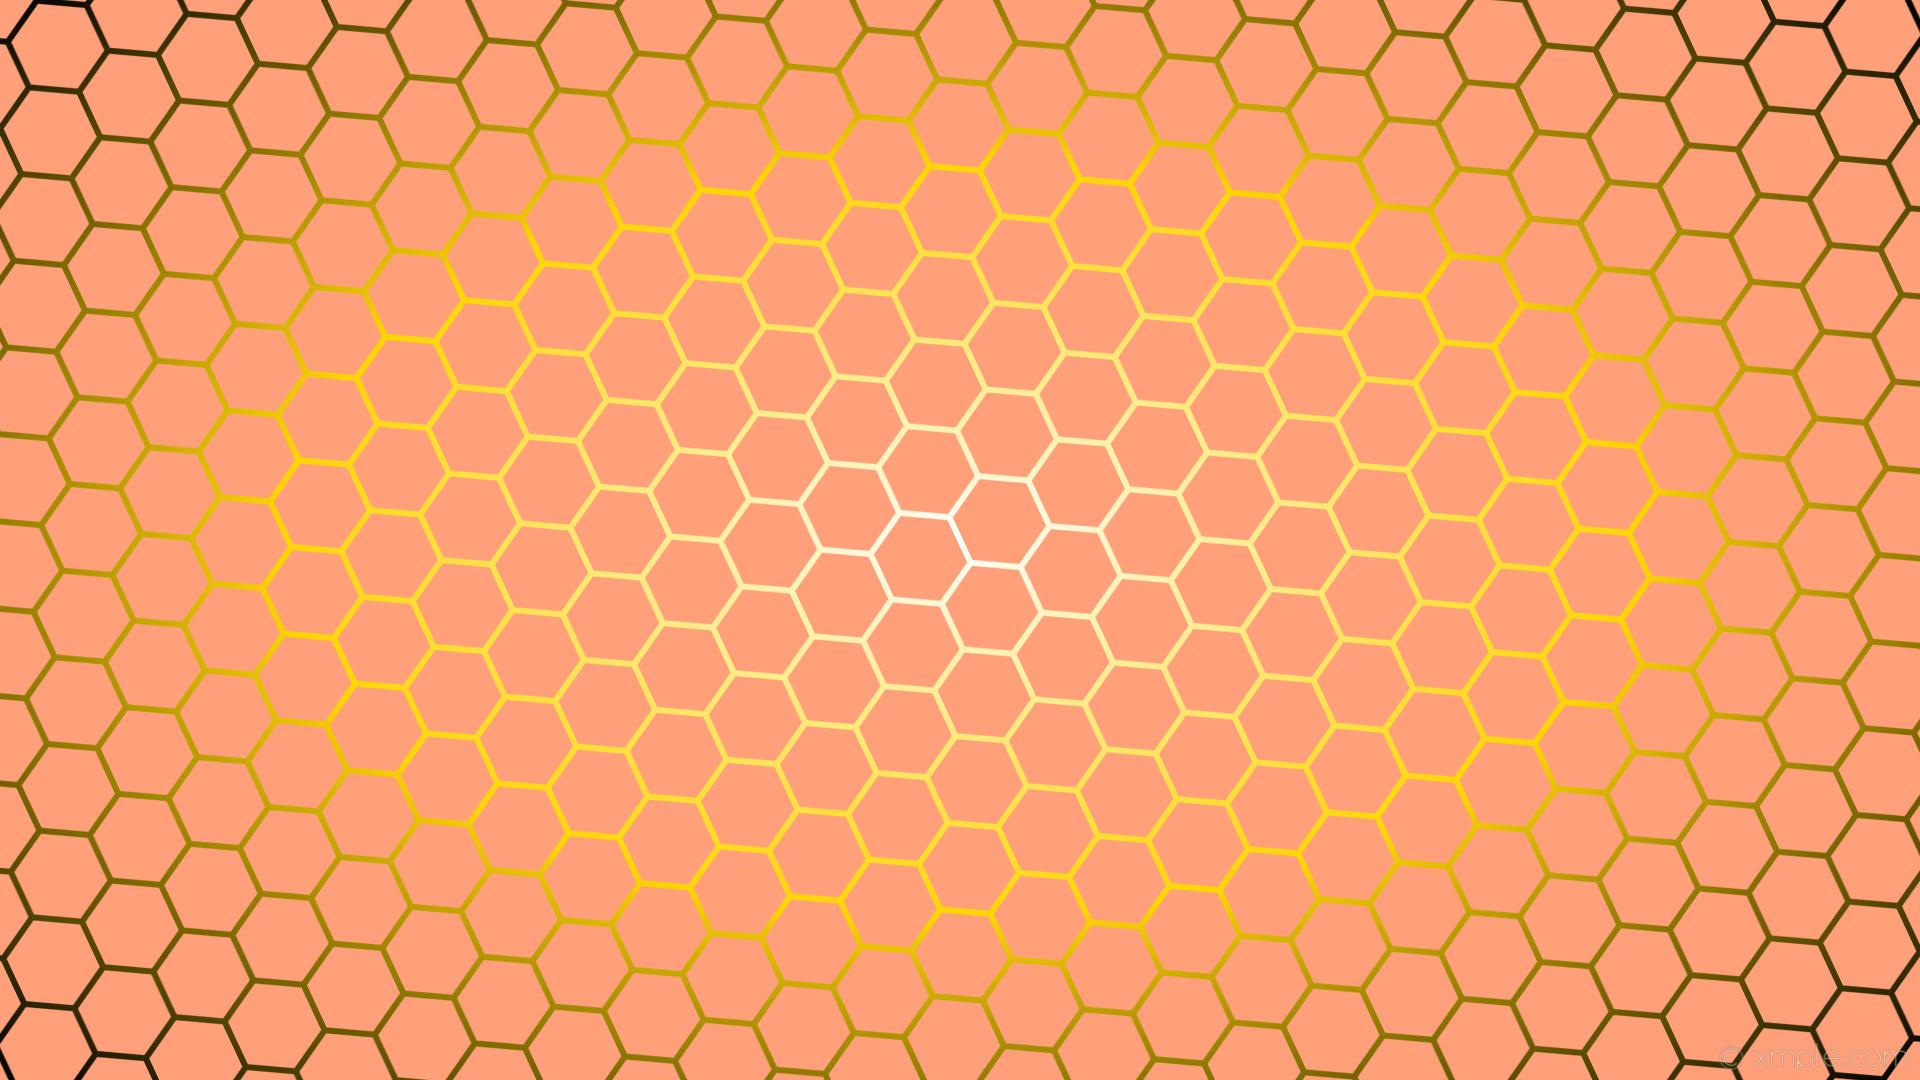 wallpaper hexagon glow white red gradient black yellow light salmon gold  #ffa07a #ffffff #